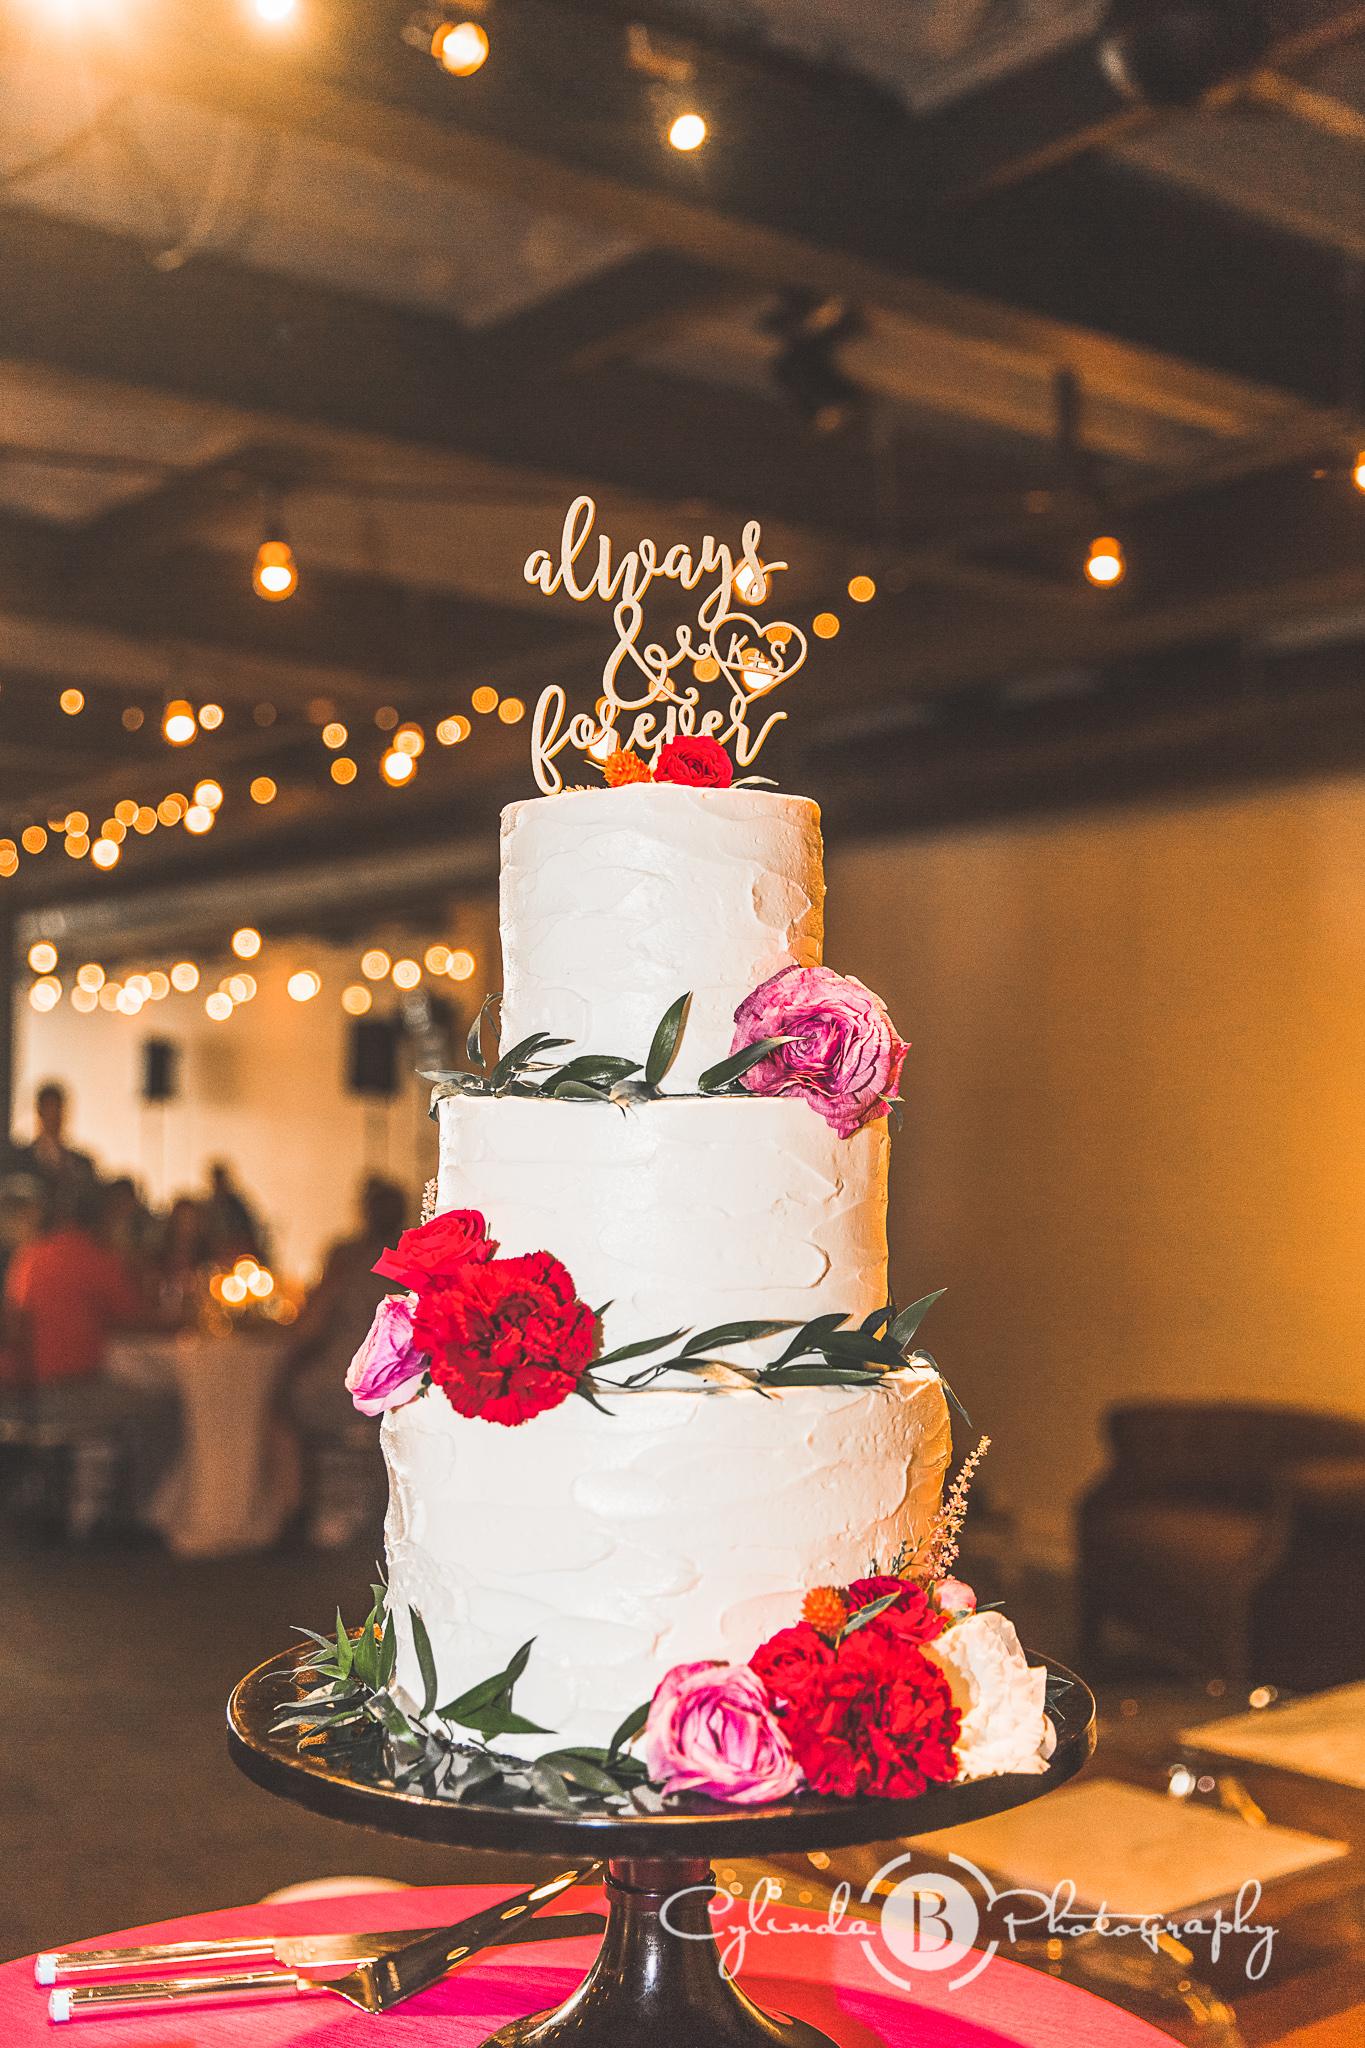 Bright wedding cake